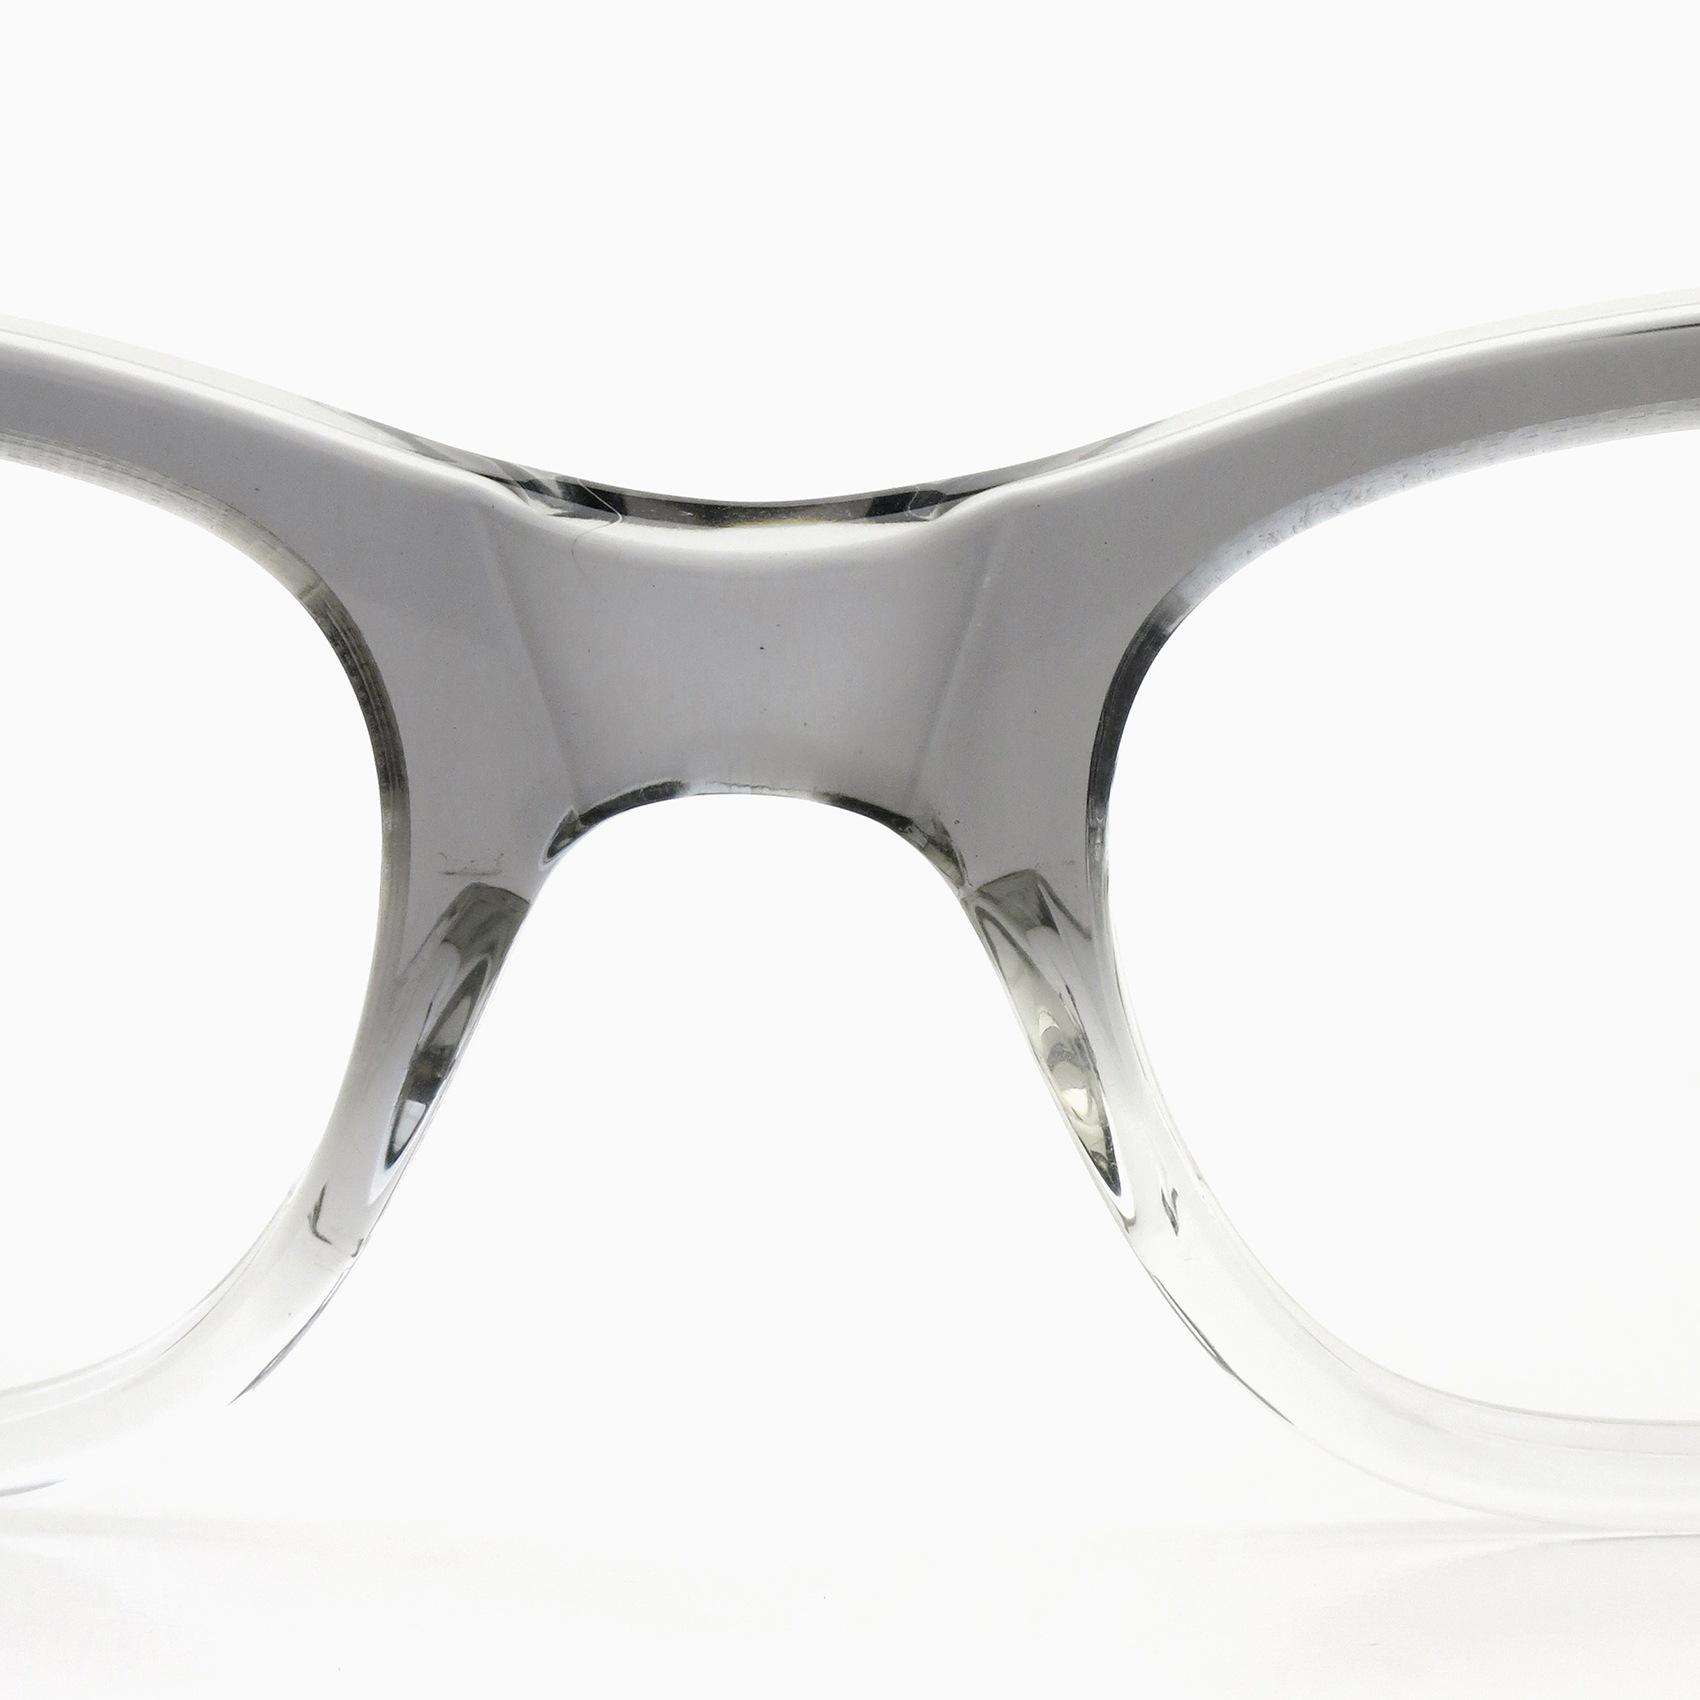 160922-vintage-tart-optical-countdown_05